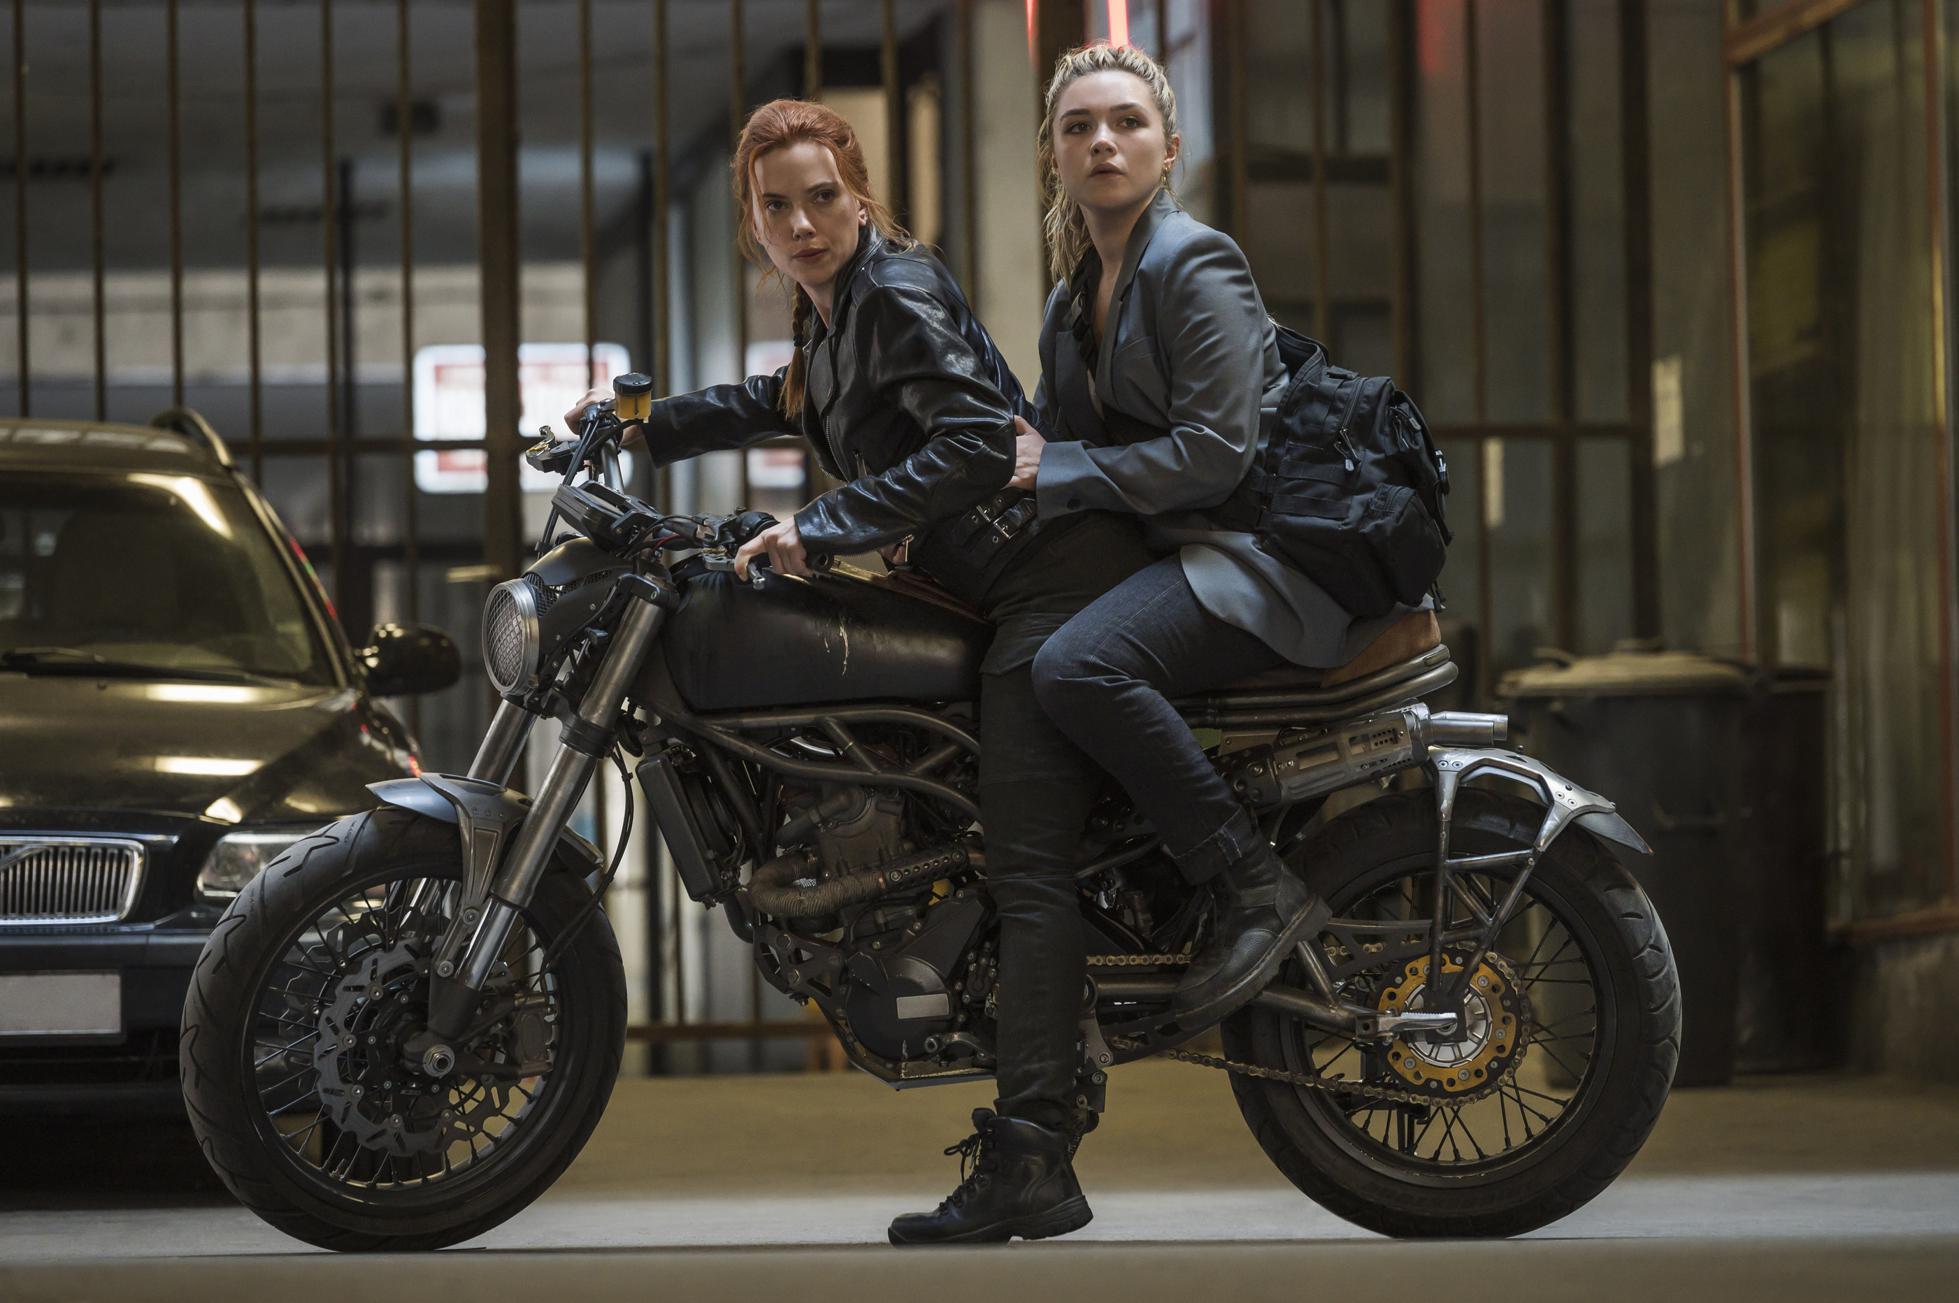 Black Widow Review: Marvel's Most Feminine Film is a Brutal Action Movie -  Den of Geek